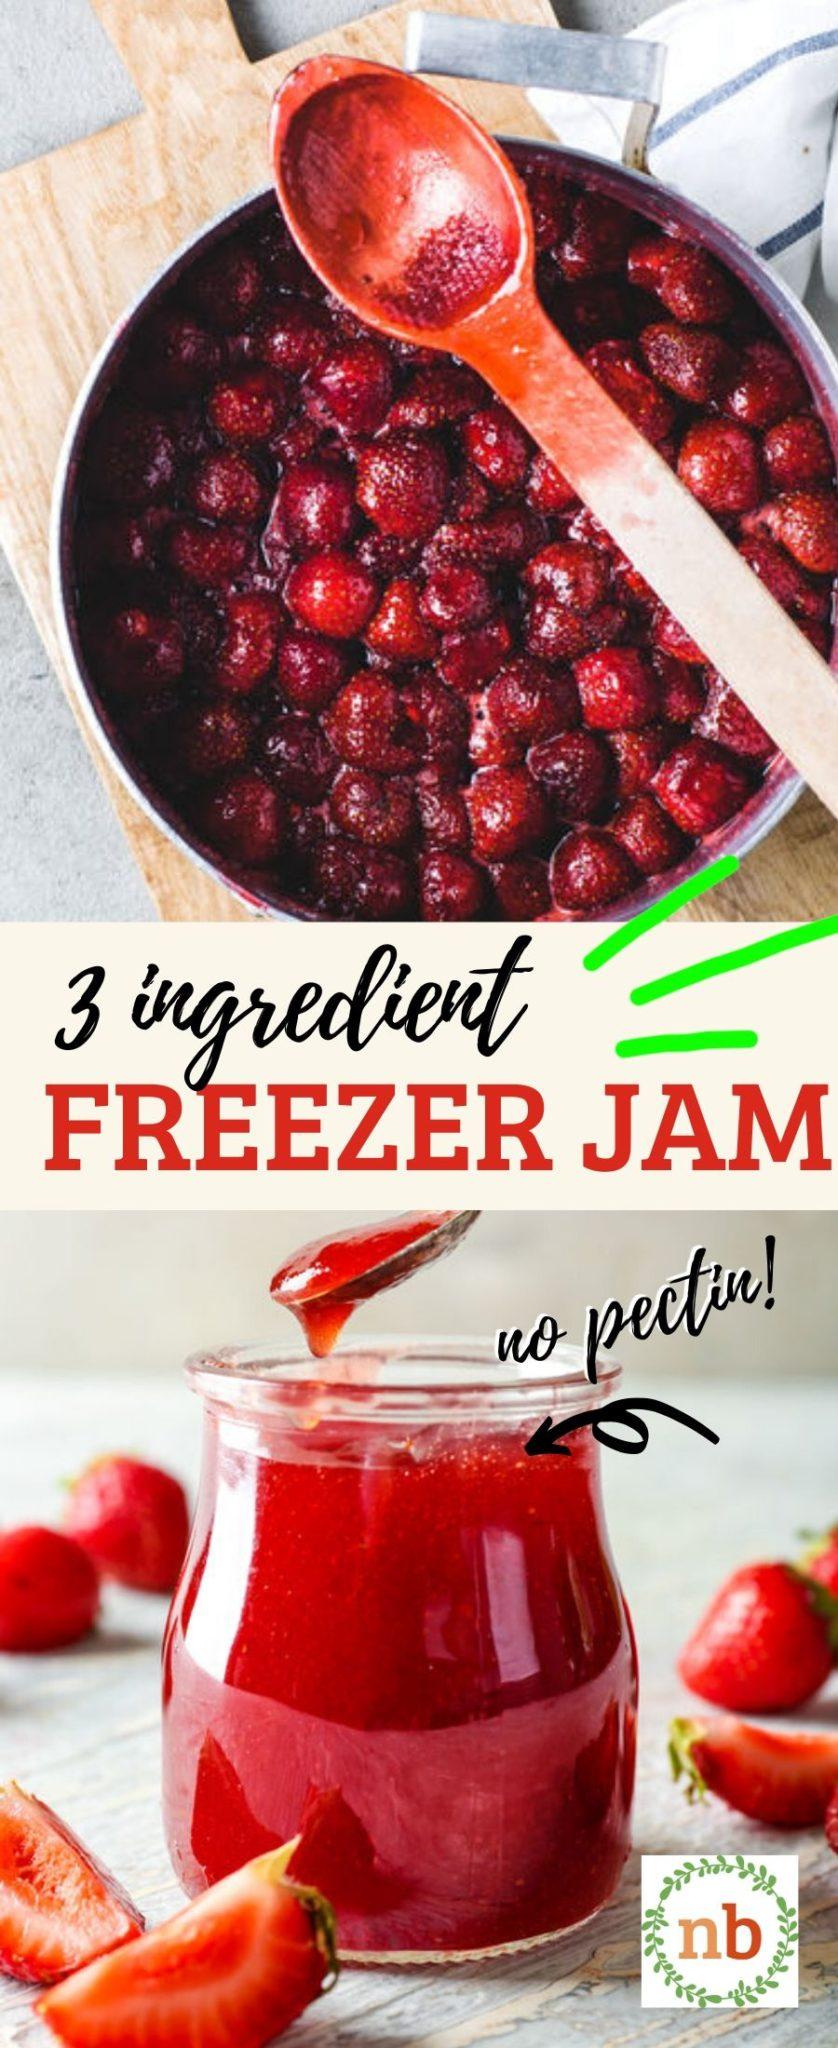 Easy Strawberry Freezer jam. No pectin and only 3 ingredients.